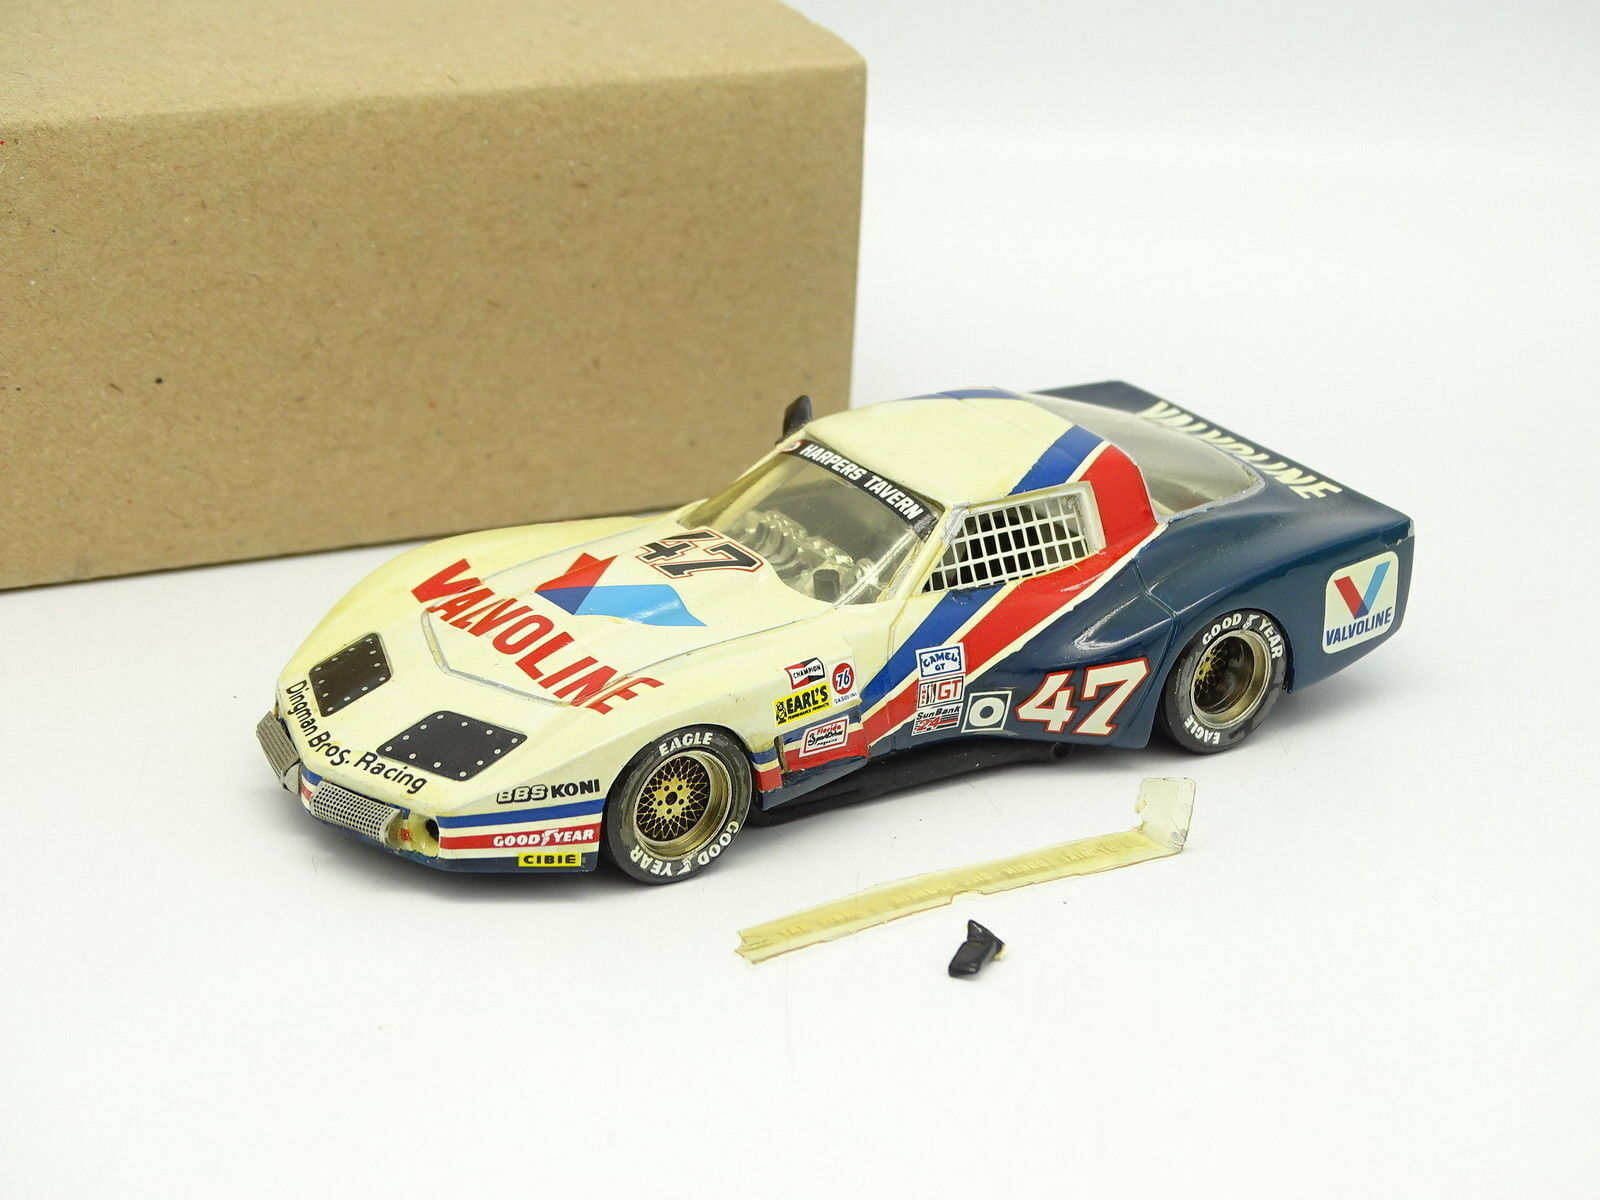 AMR Kit Monté SB 1 43 43 43 - Chevrolet Corvette Daytona 1984 N°47 Valvoline  Mejor precio